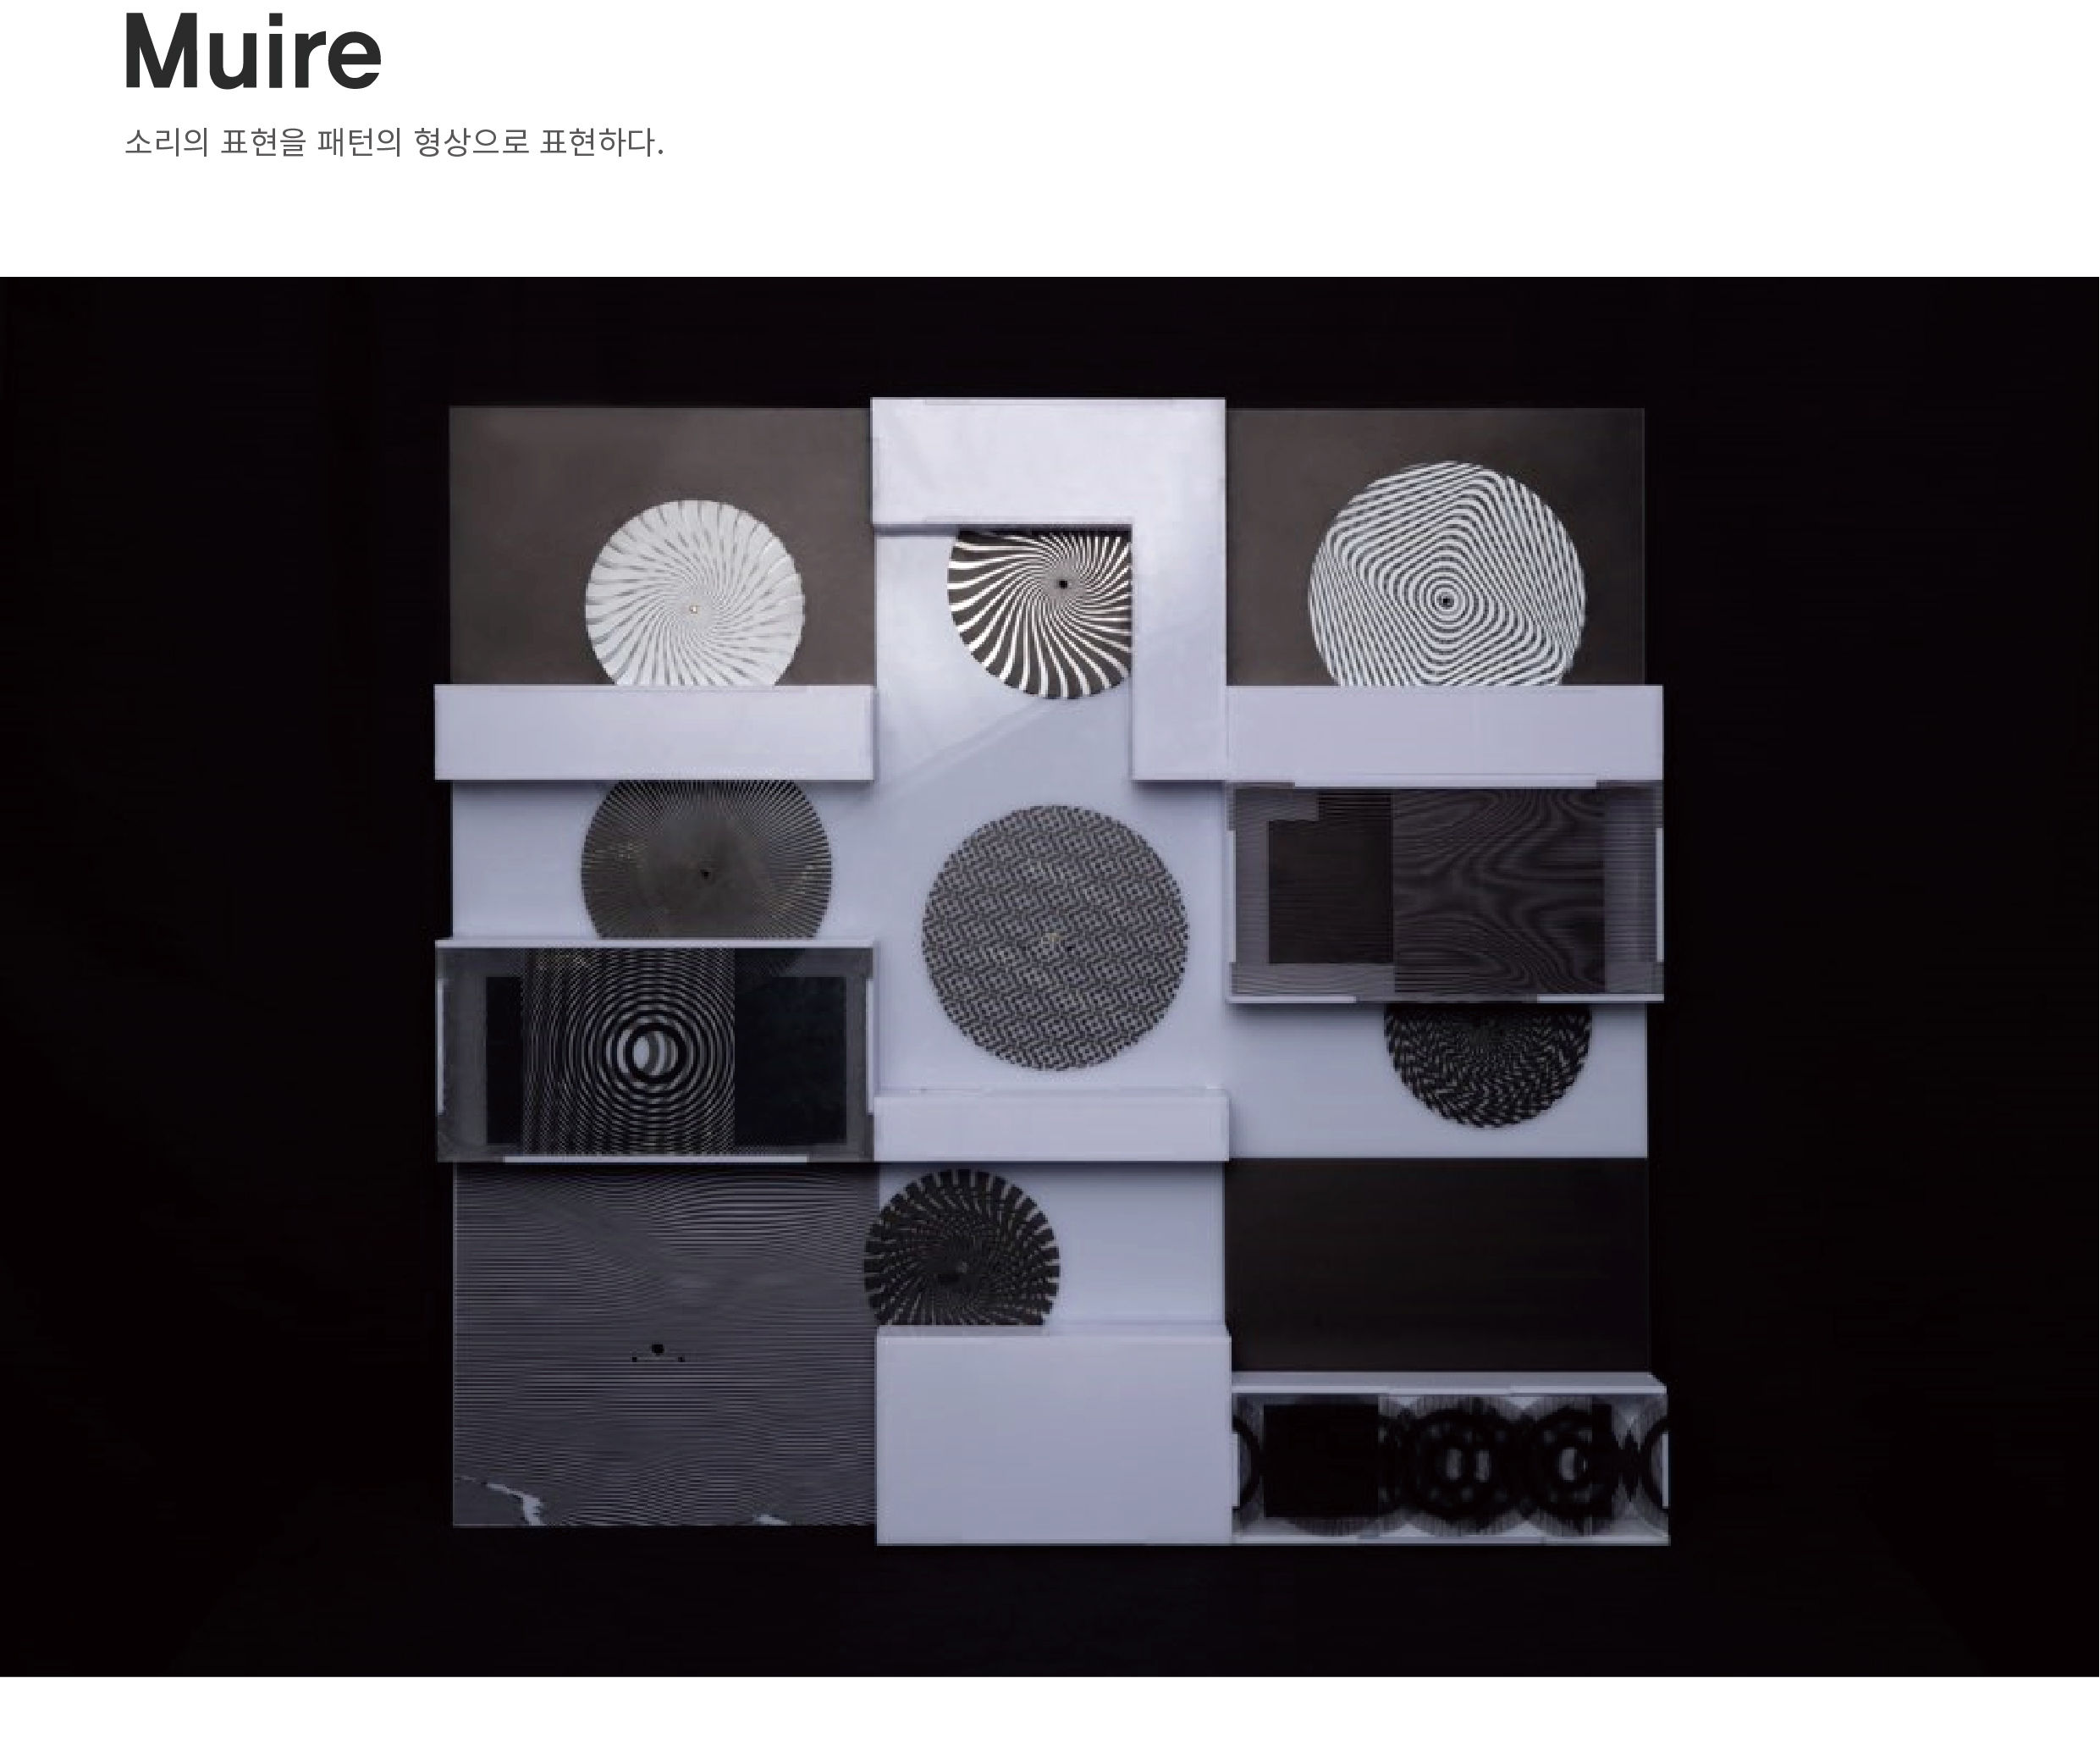 Muire